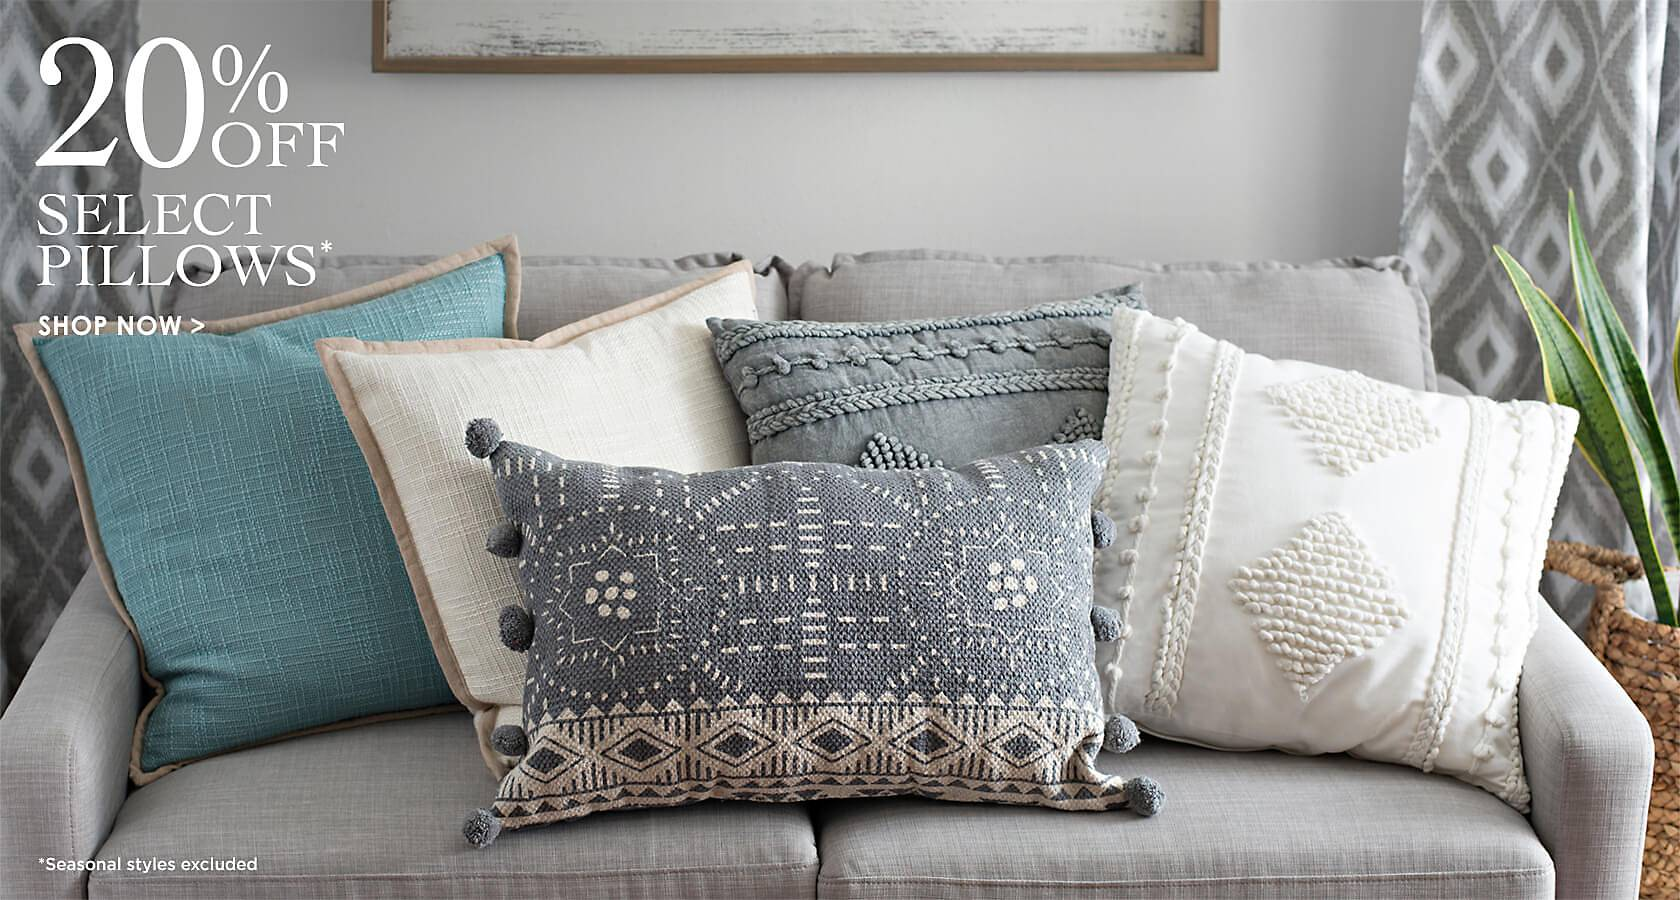 20% Off Select Pillows - Shop Now